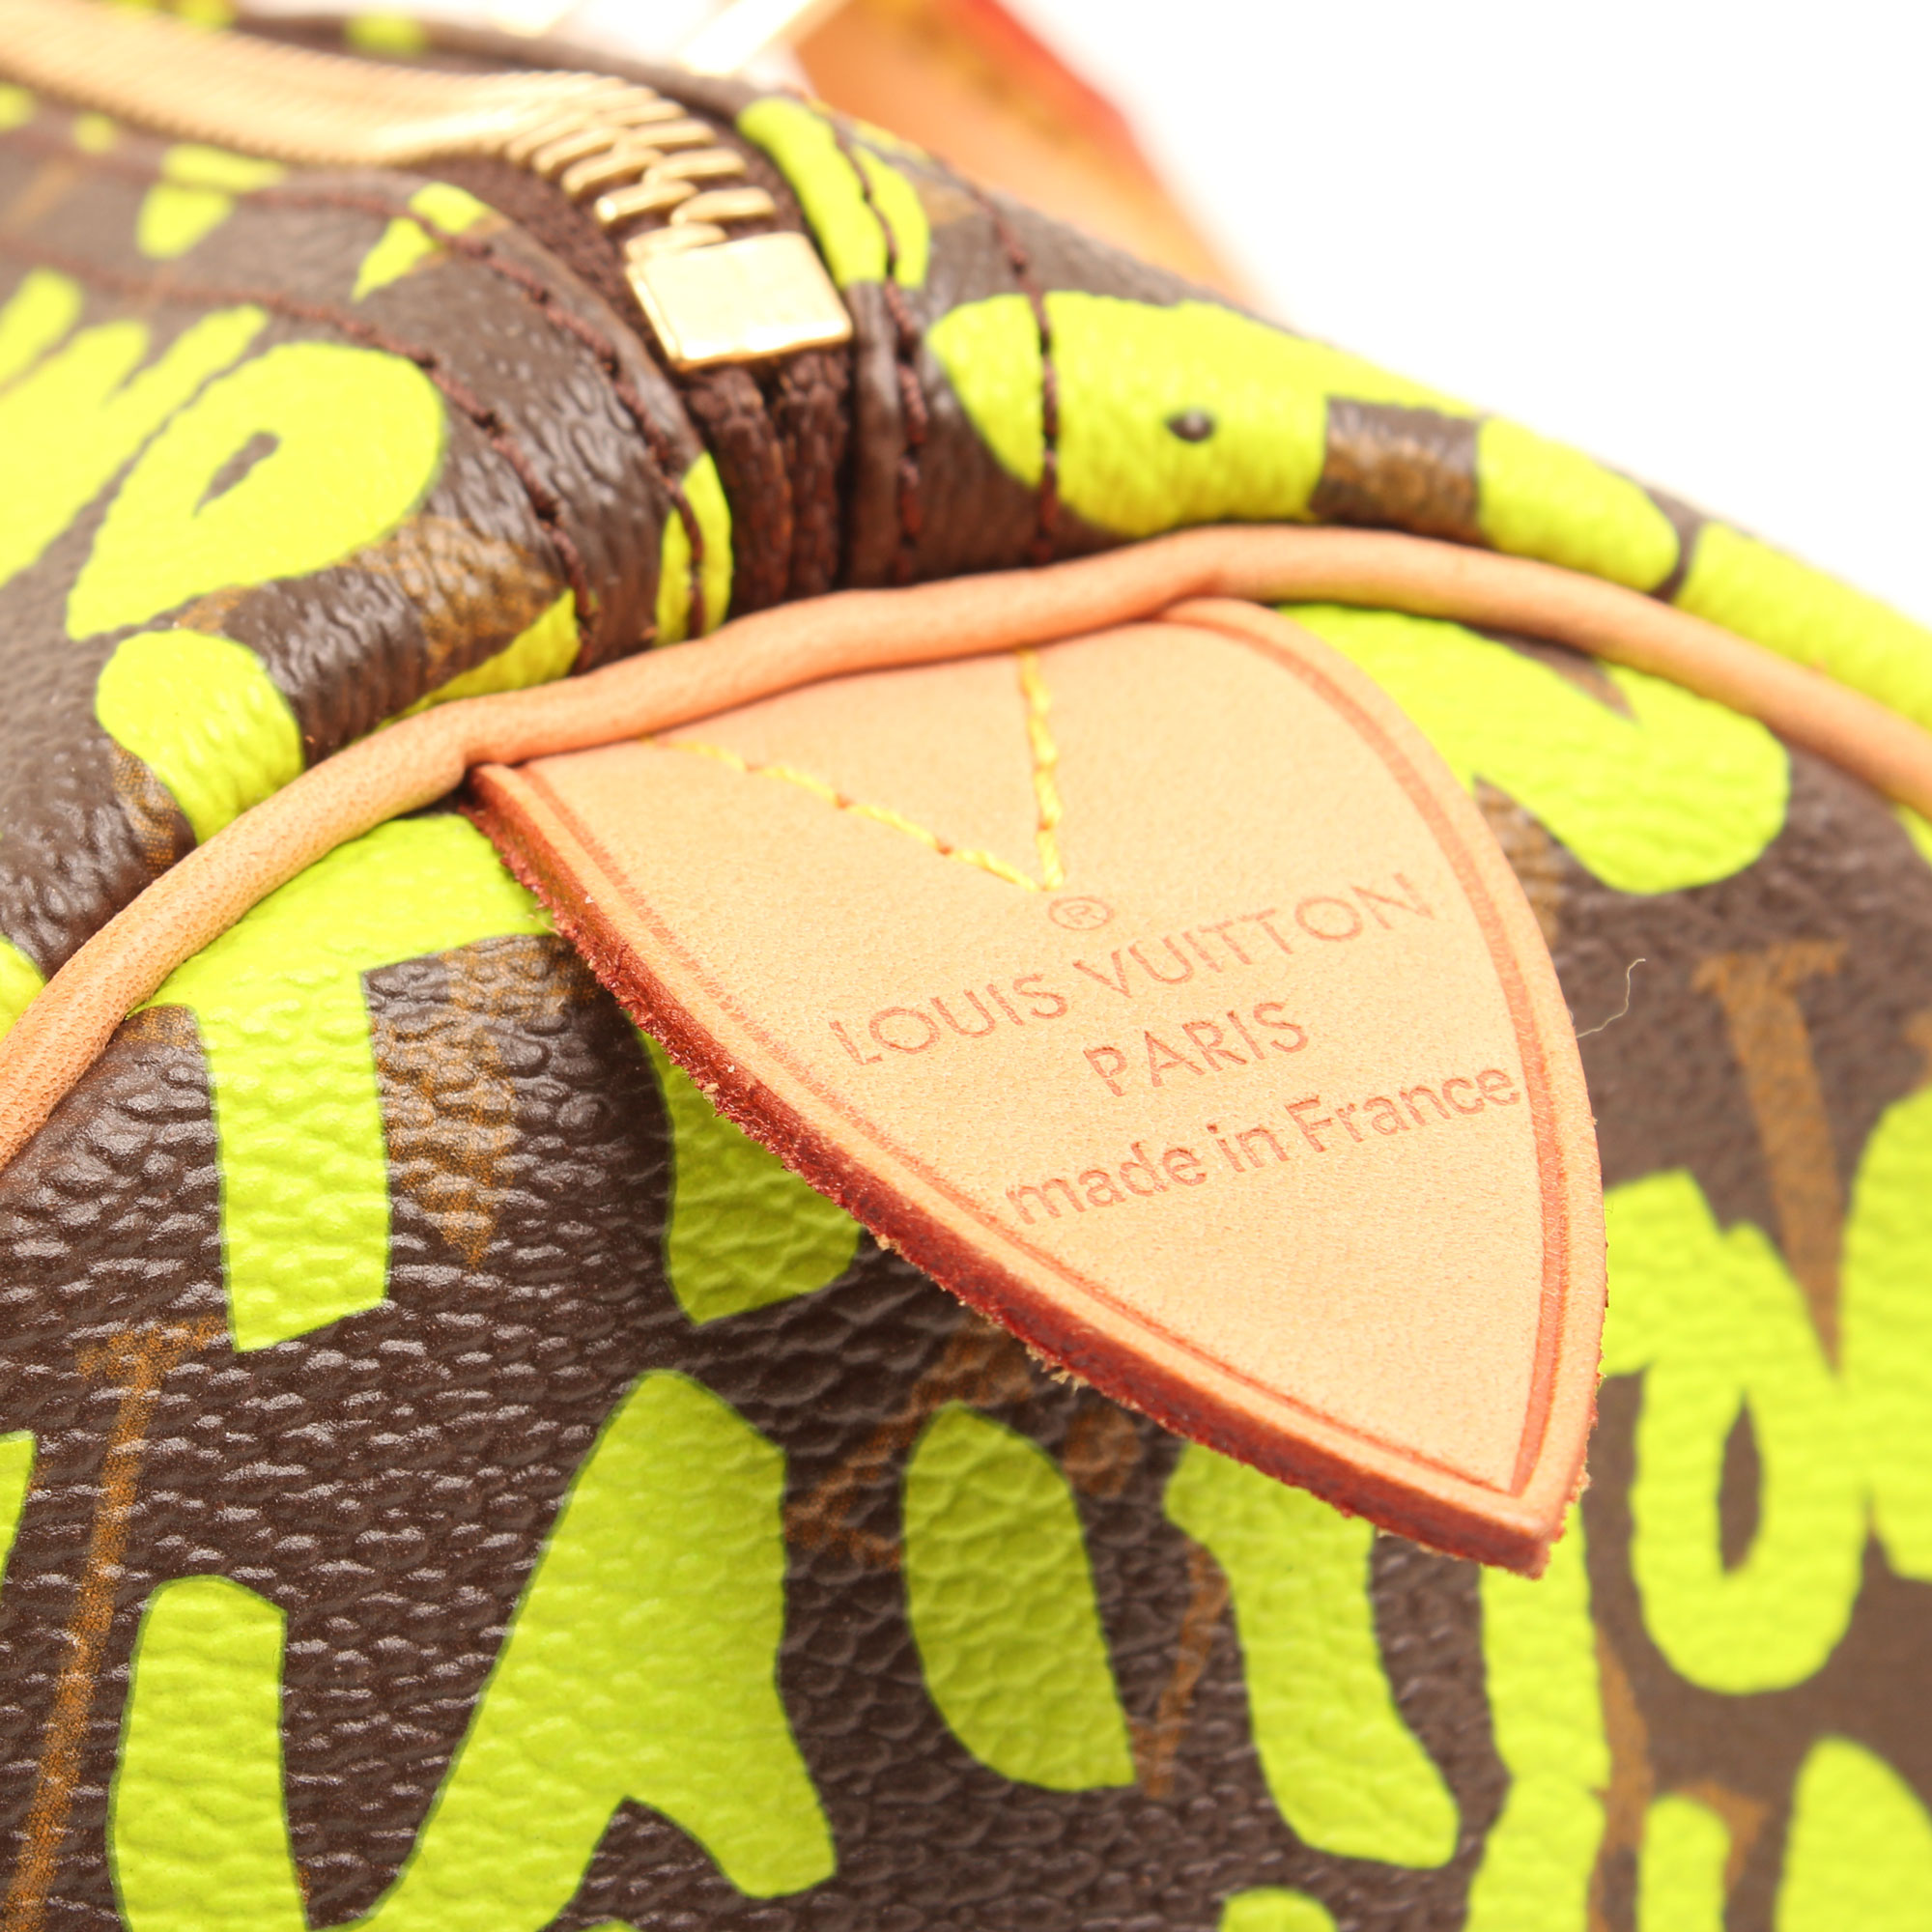 Imagen de la marca del bolso louis vuitton speedy 30 graffiti verde